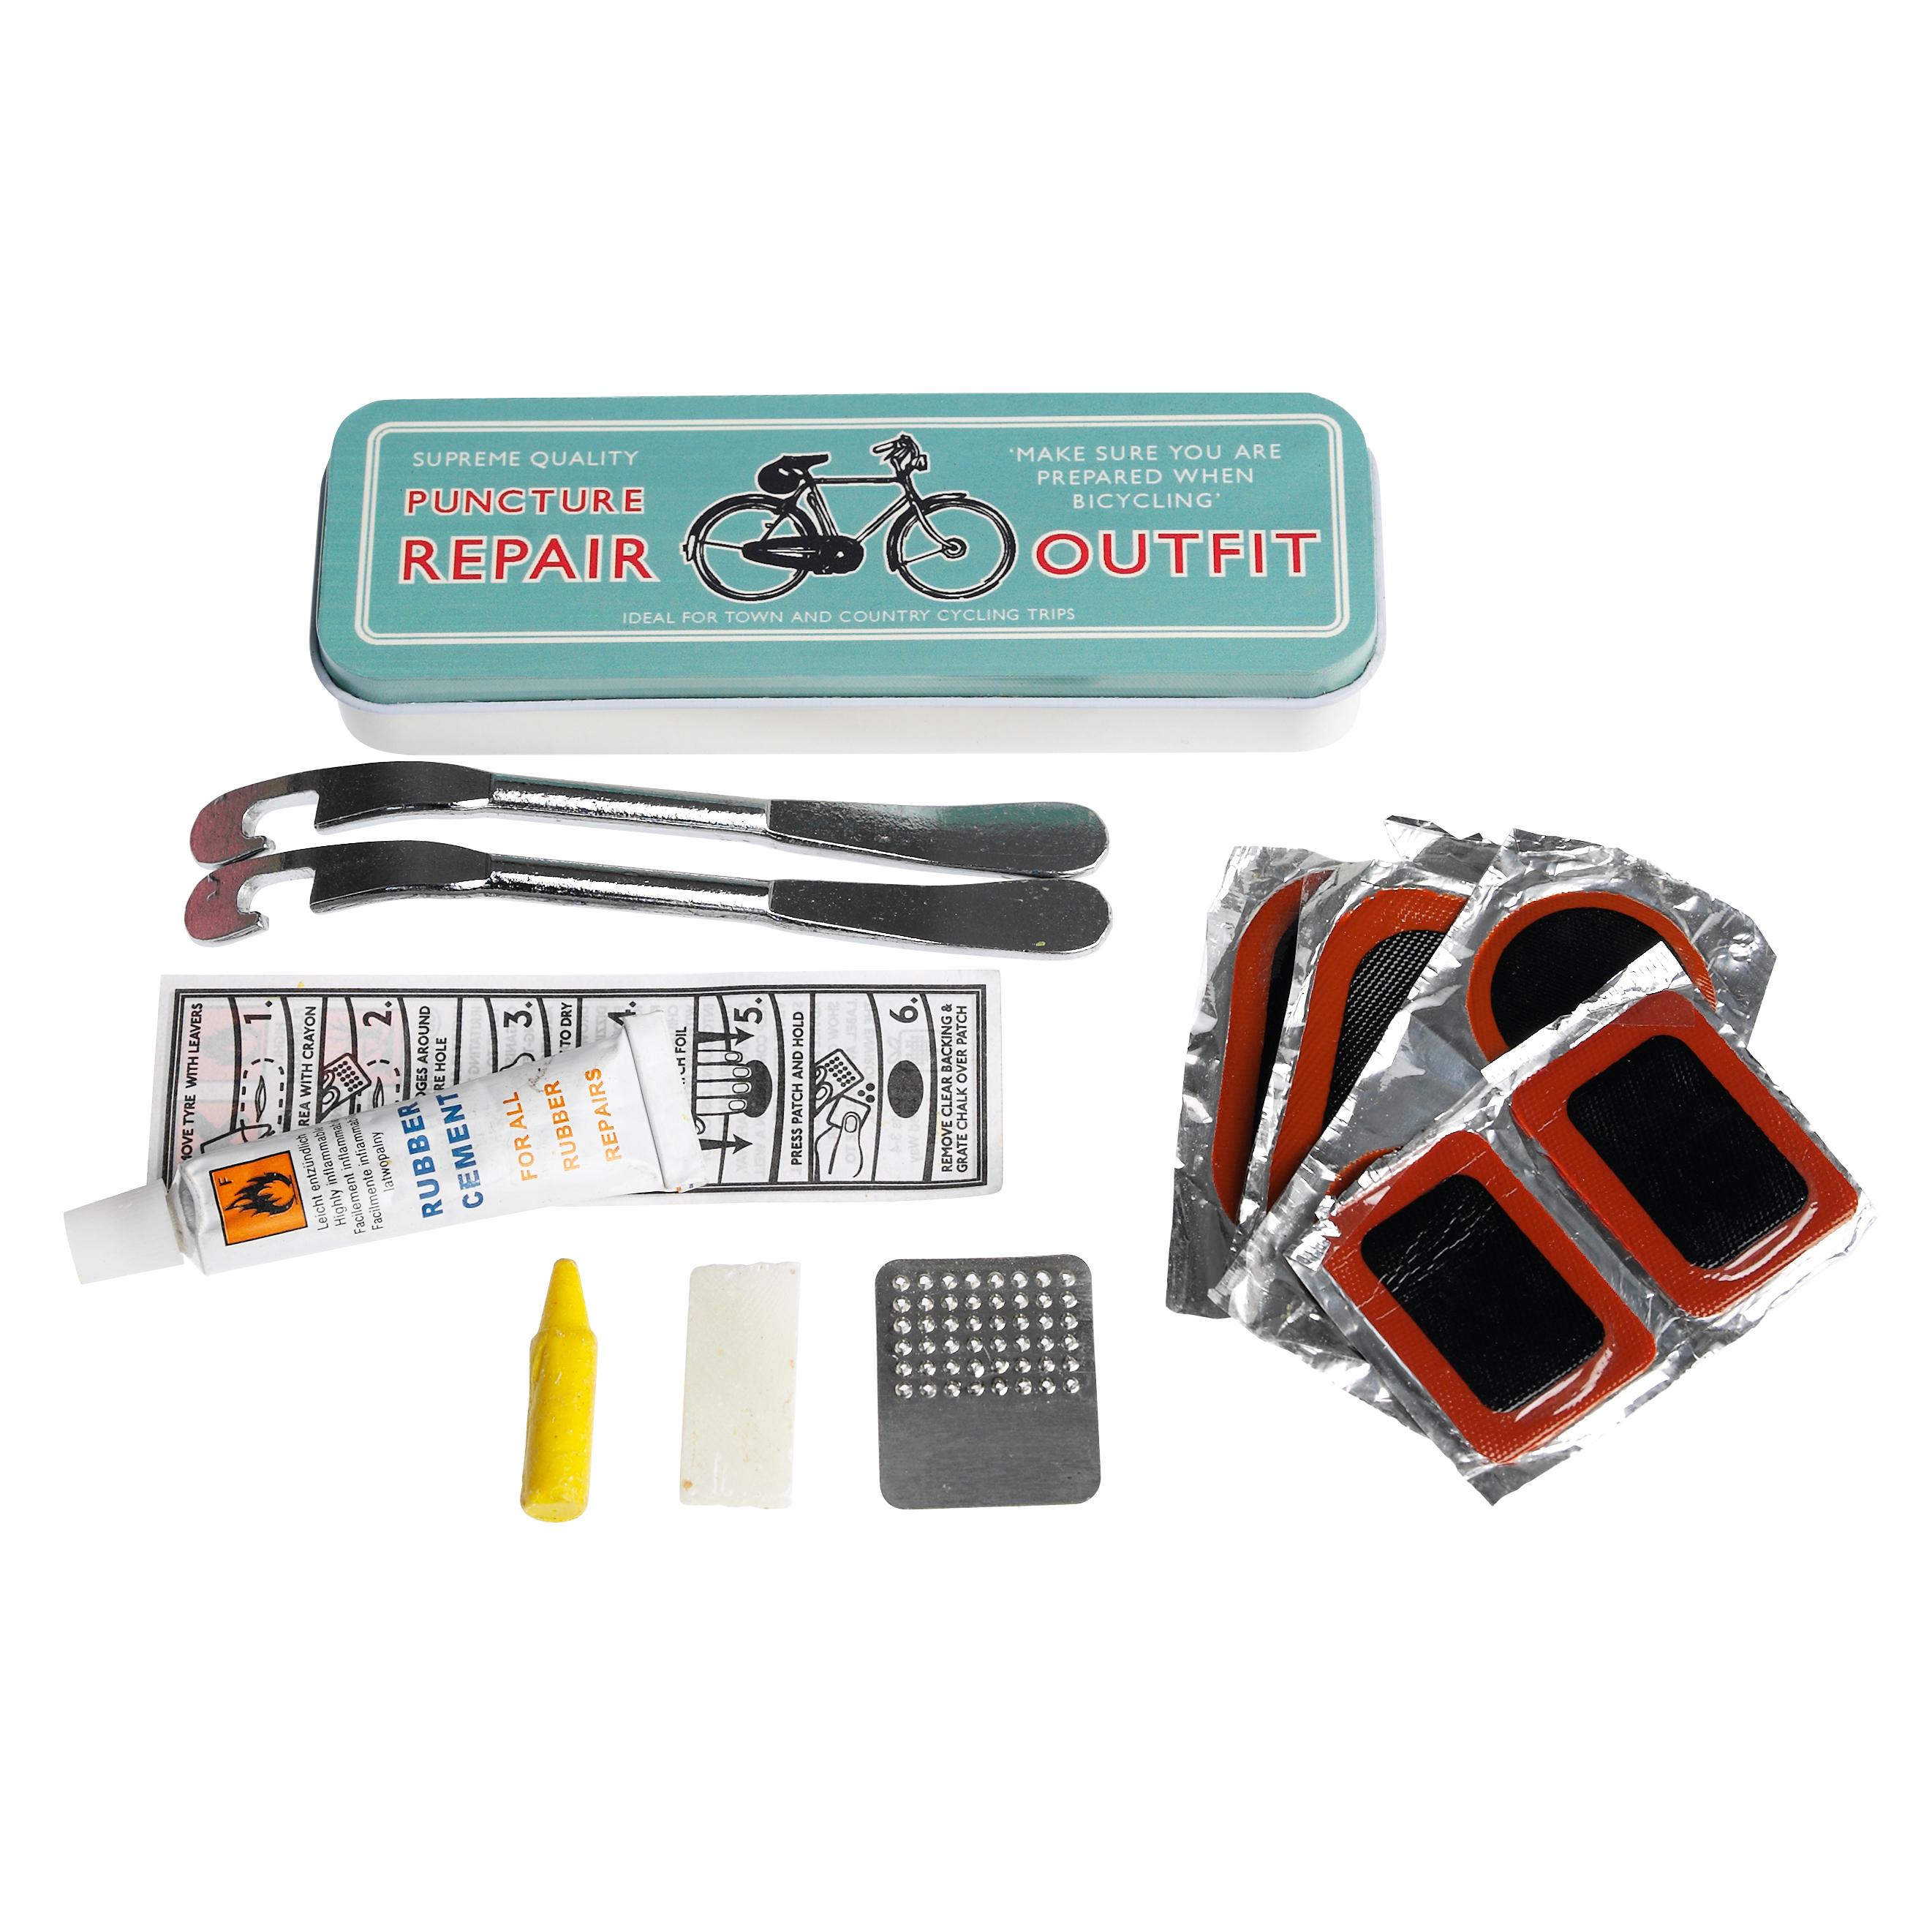 Bicycle Puncture Repair Kit Rex London At Dotcomgiftshop